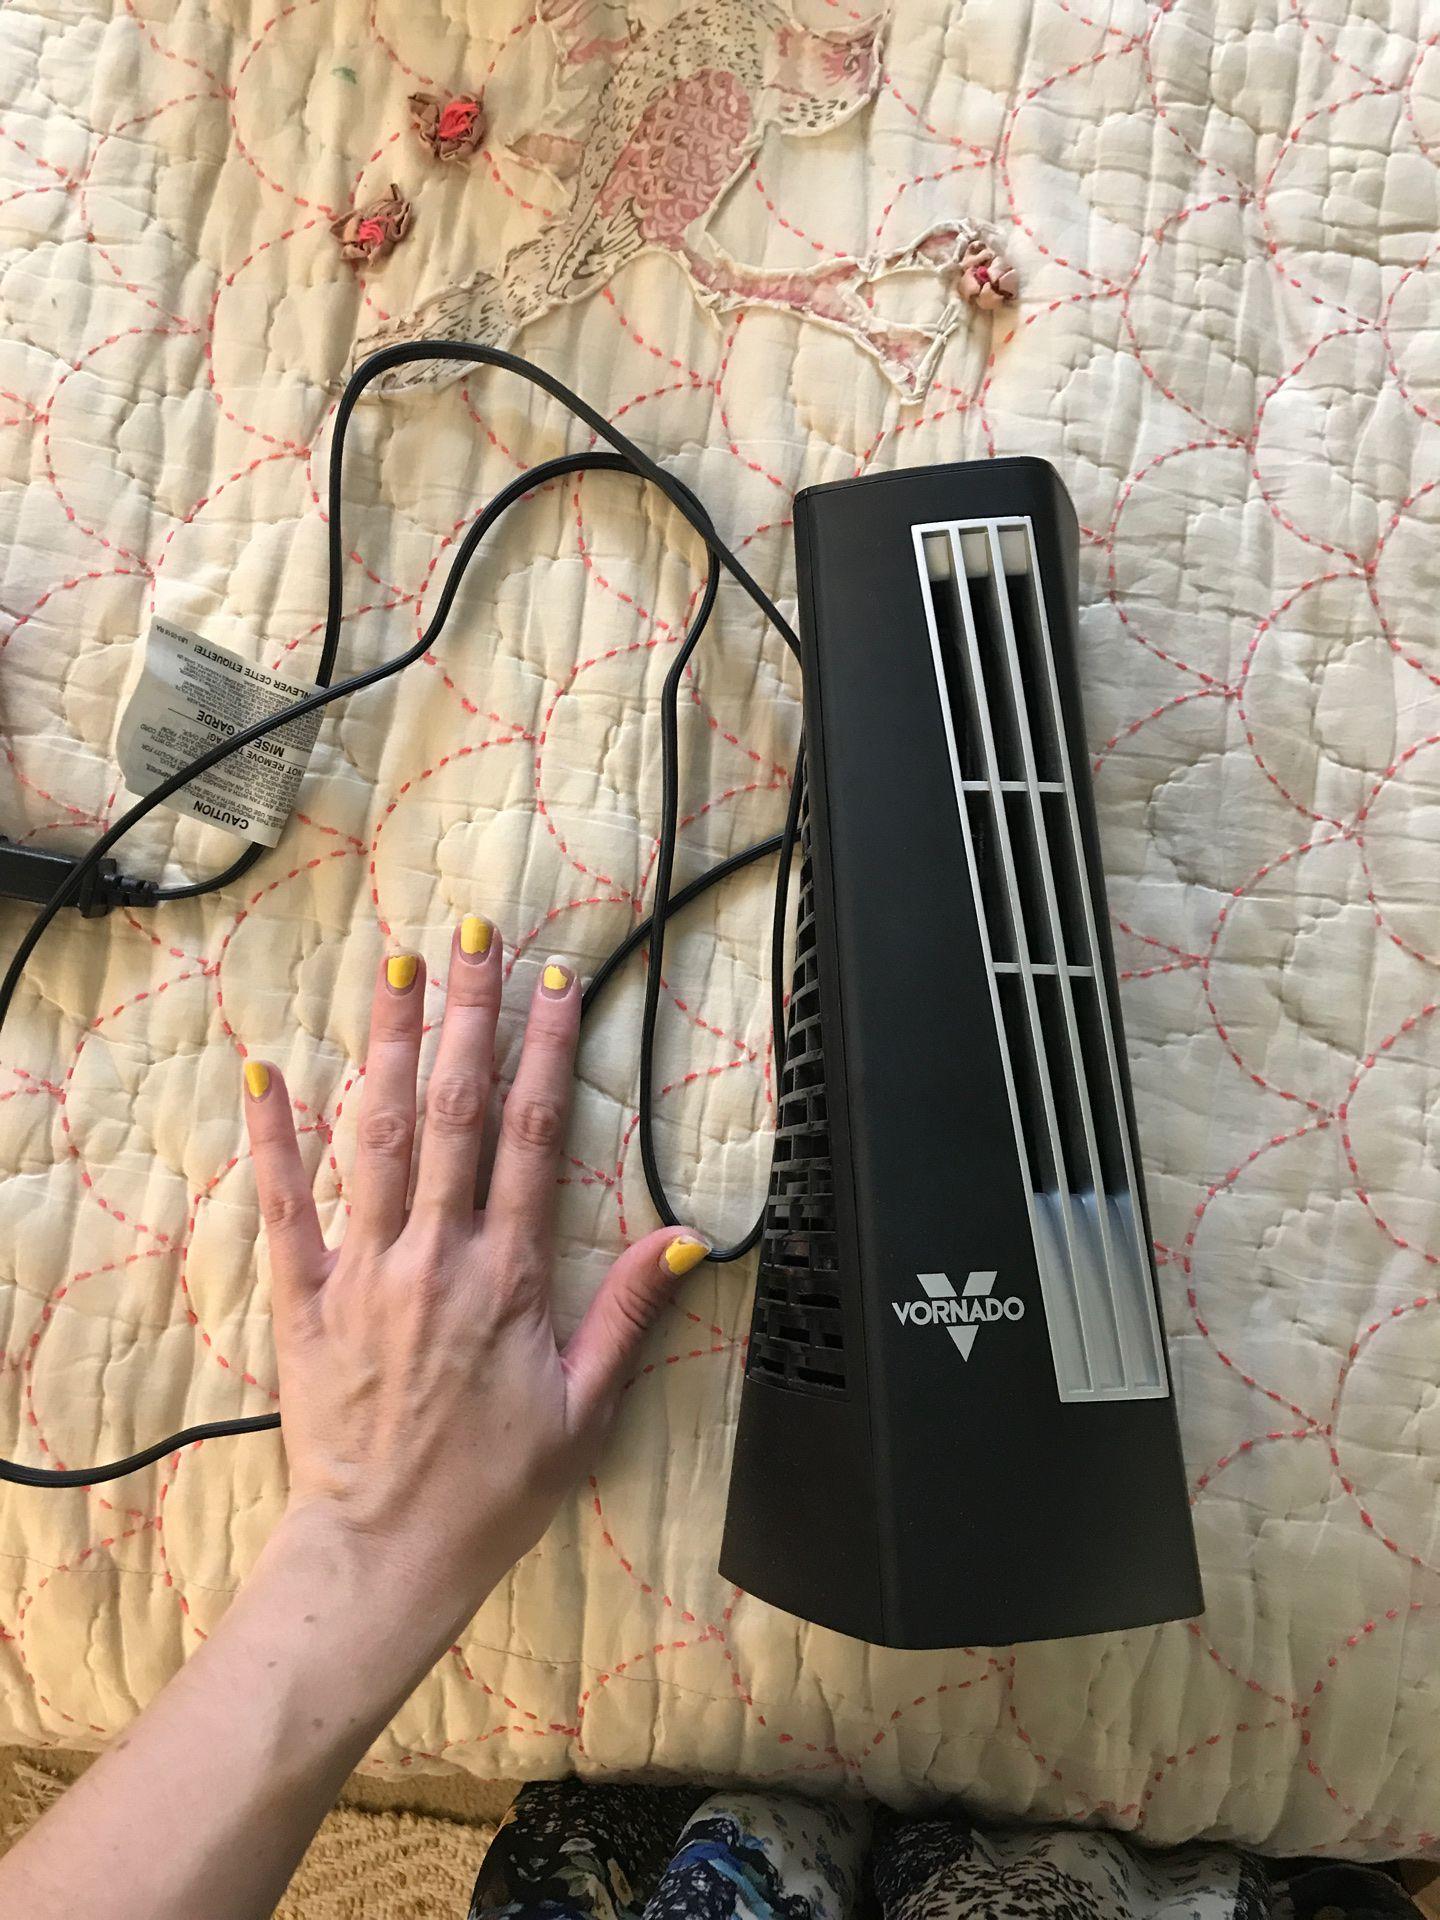 small oscillating fan